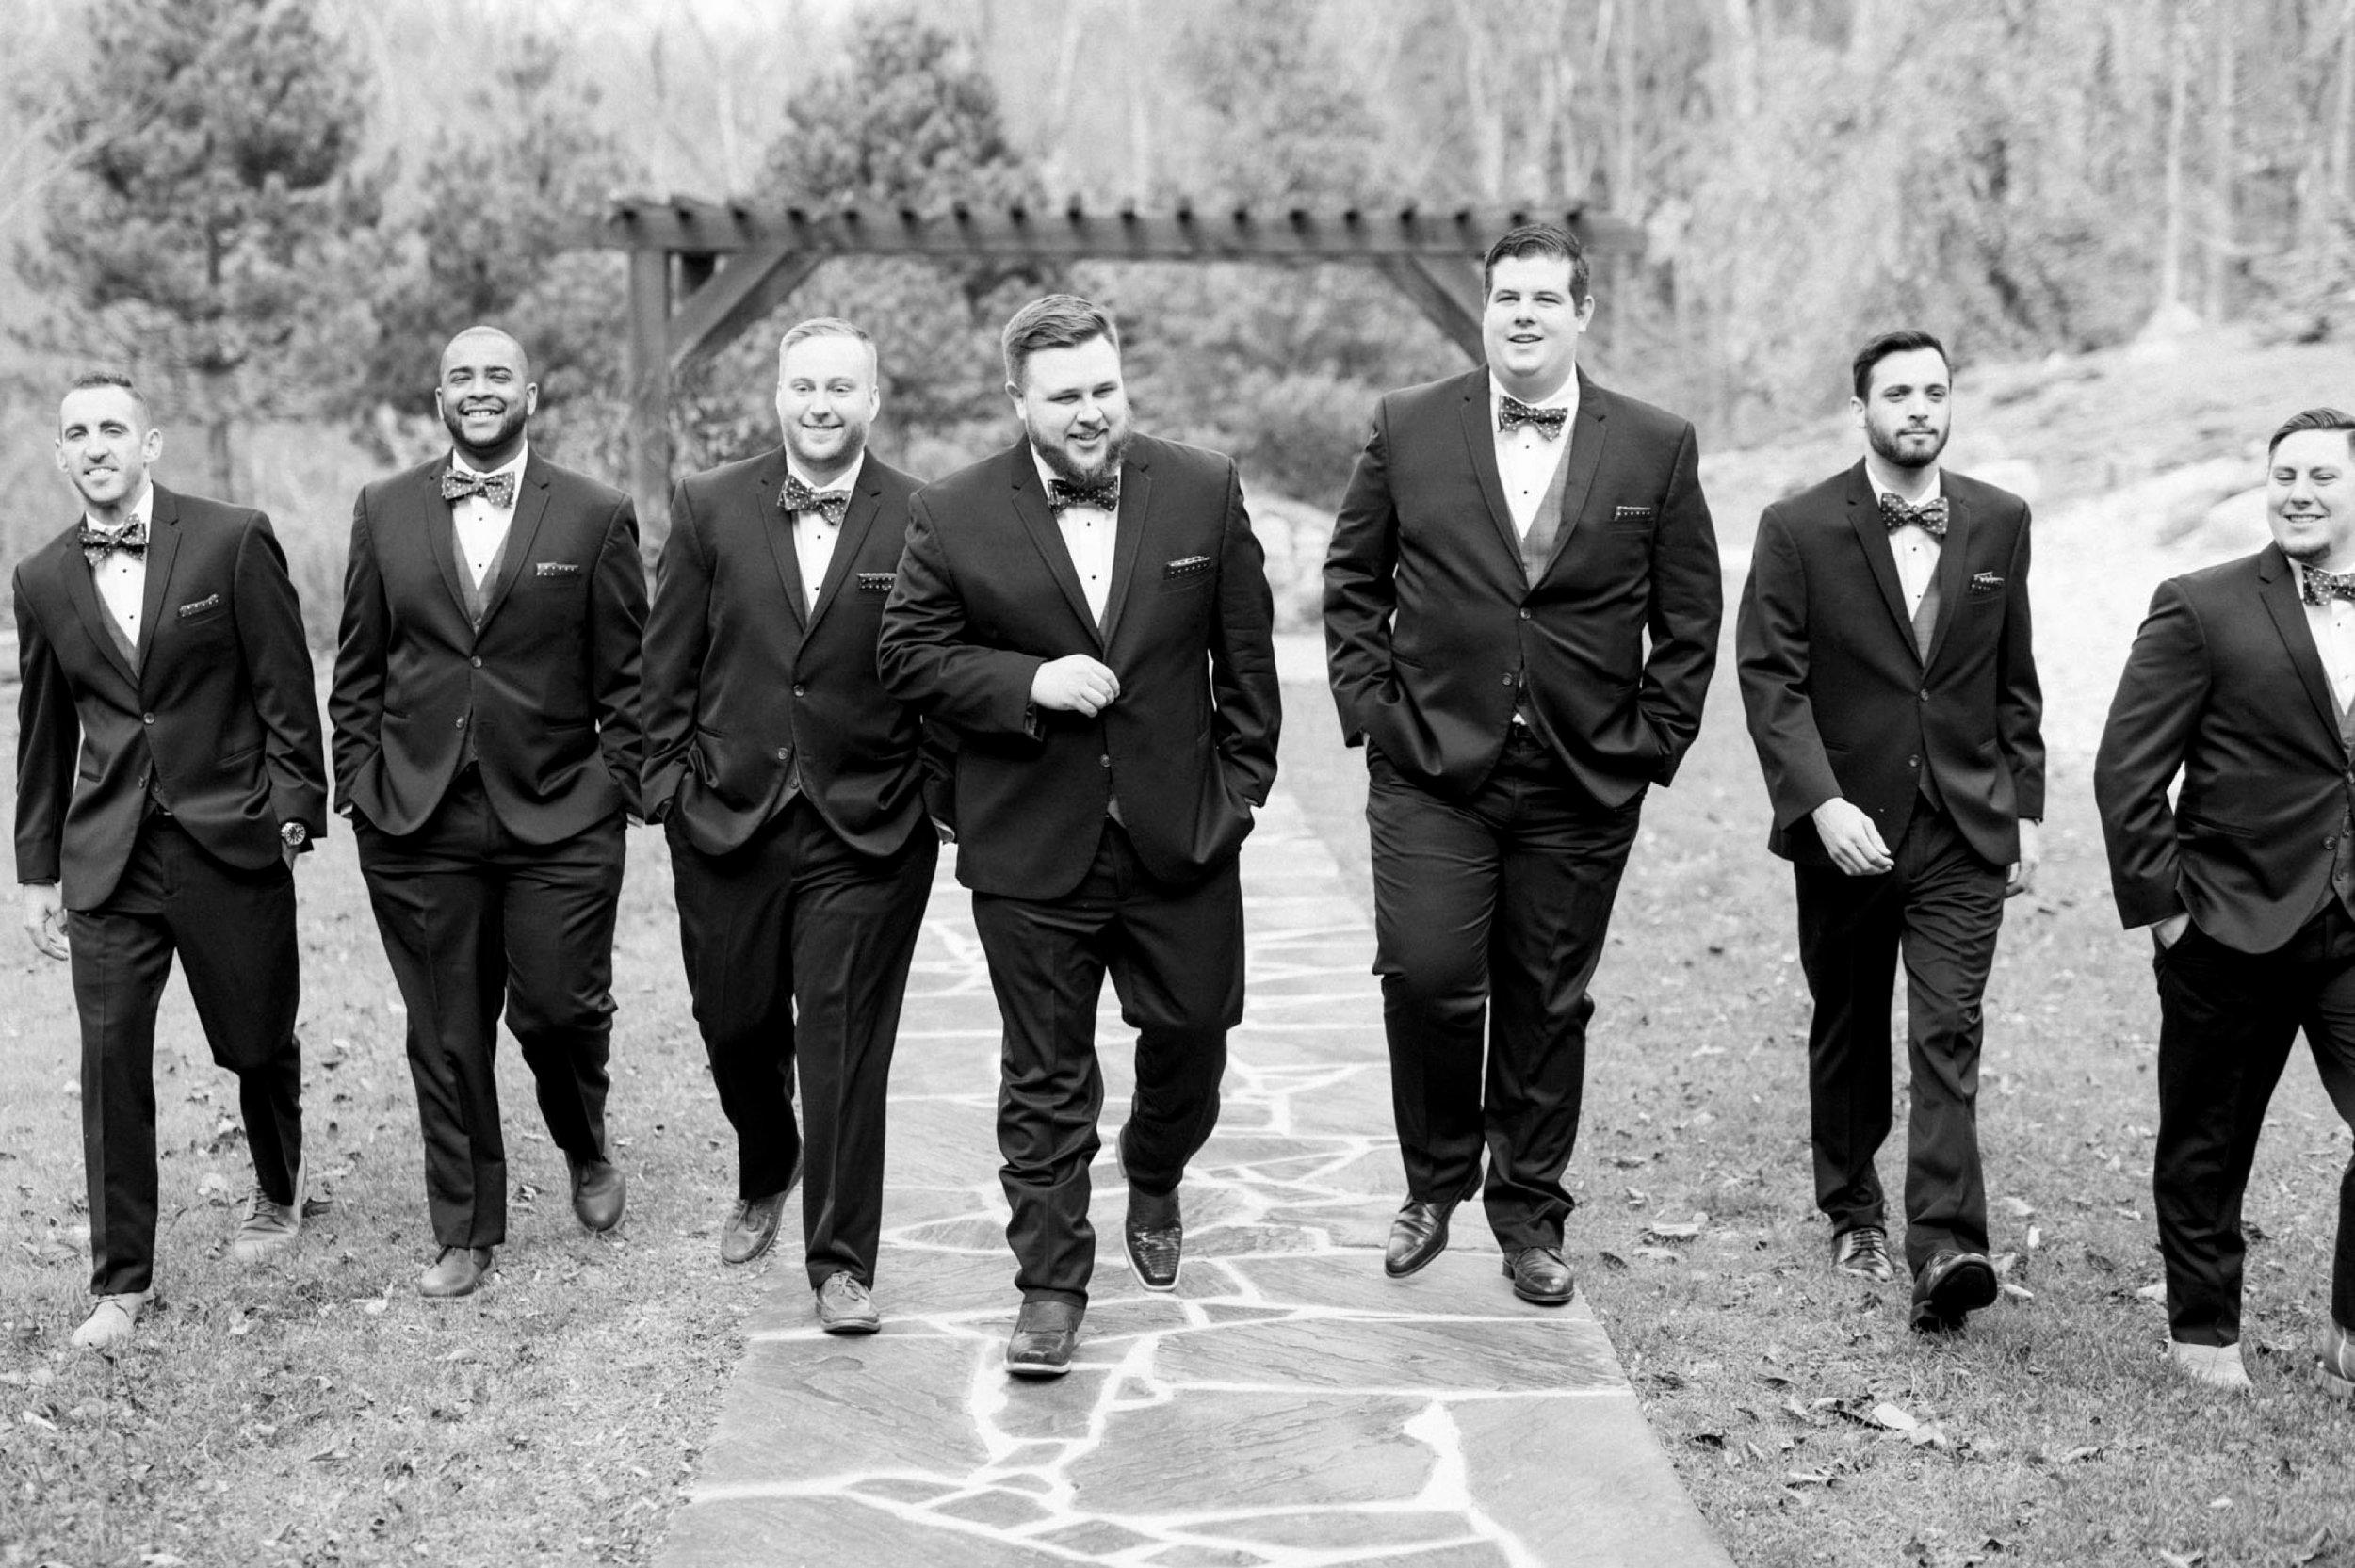 IrvineEstate_LexingtonVA_Wedding_FallWedding_VirginiaWeddingPhotographer 27.jpg